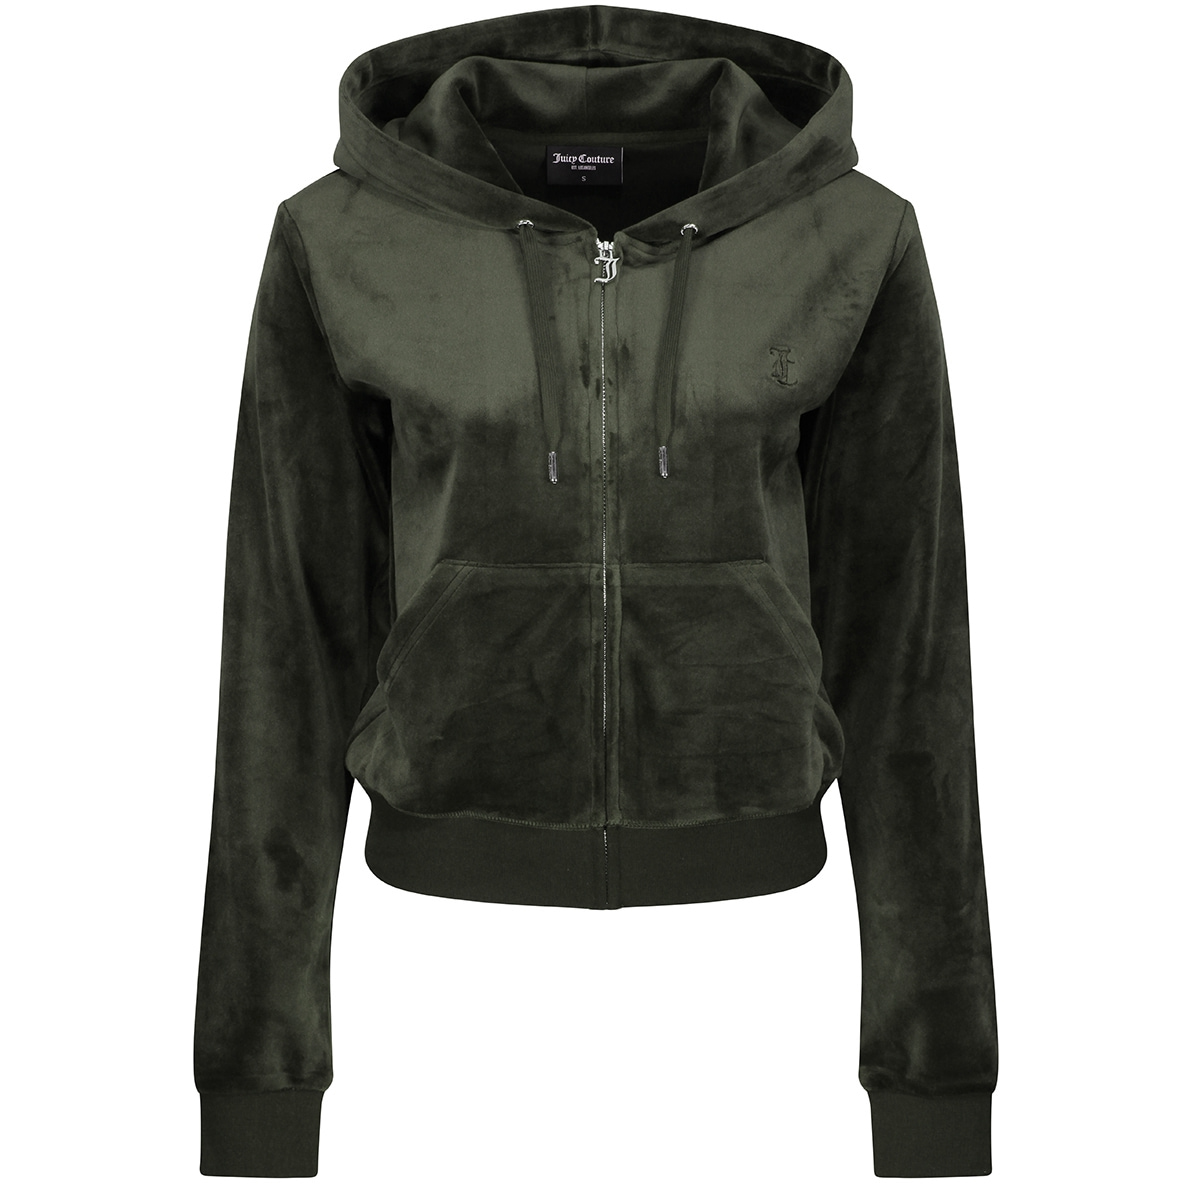 Juicy Couture - Jakke Roberston Velour Dark Moss